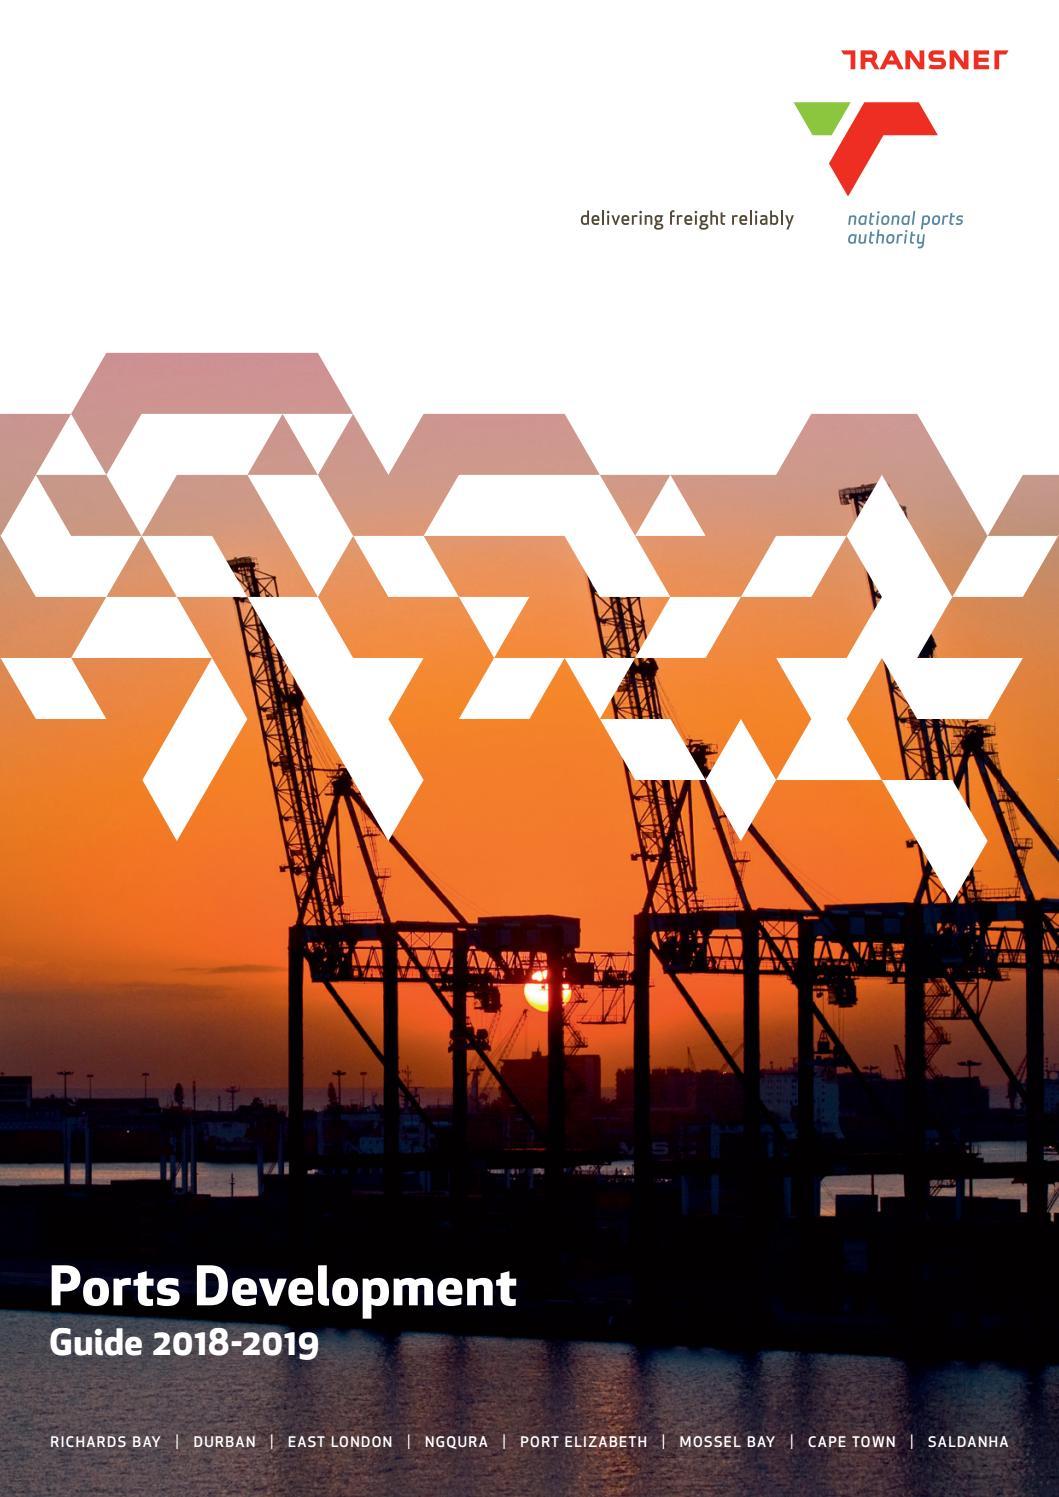 Transnet Ports Development Guide 2018 2019 By Land Marine Publications Ltd Issuu